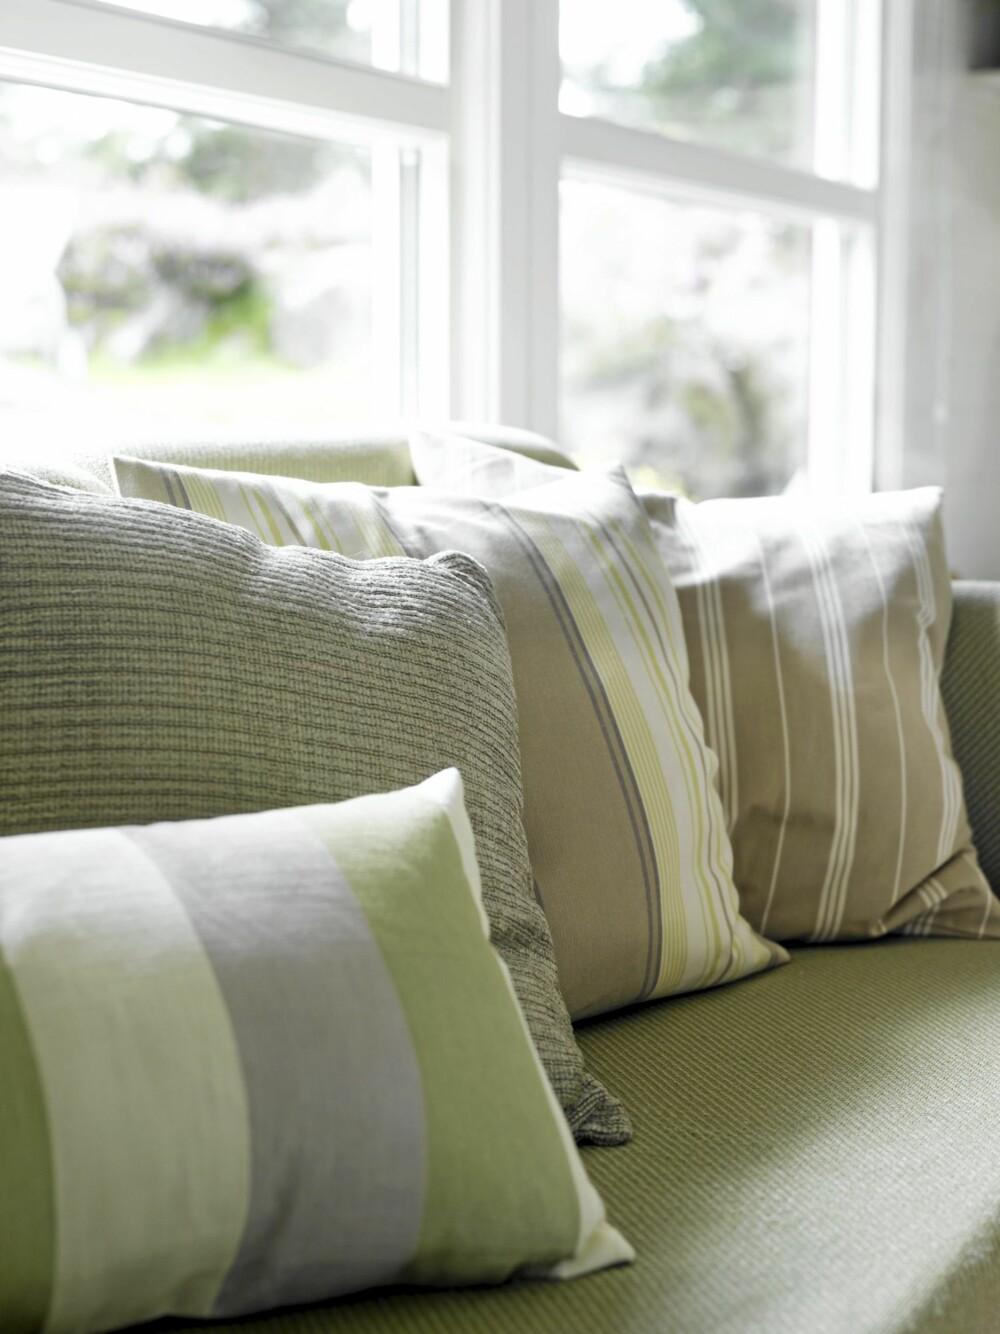 FRISKE PUTER: Sofaen har fått et friskt uttrykk med frodige pynteputer. De to bakerste har Reidun sydd med tekstiler fra Green Apple, mens de fremste er fra Kid interiør.